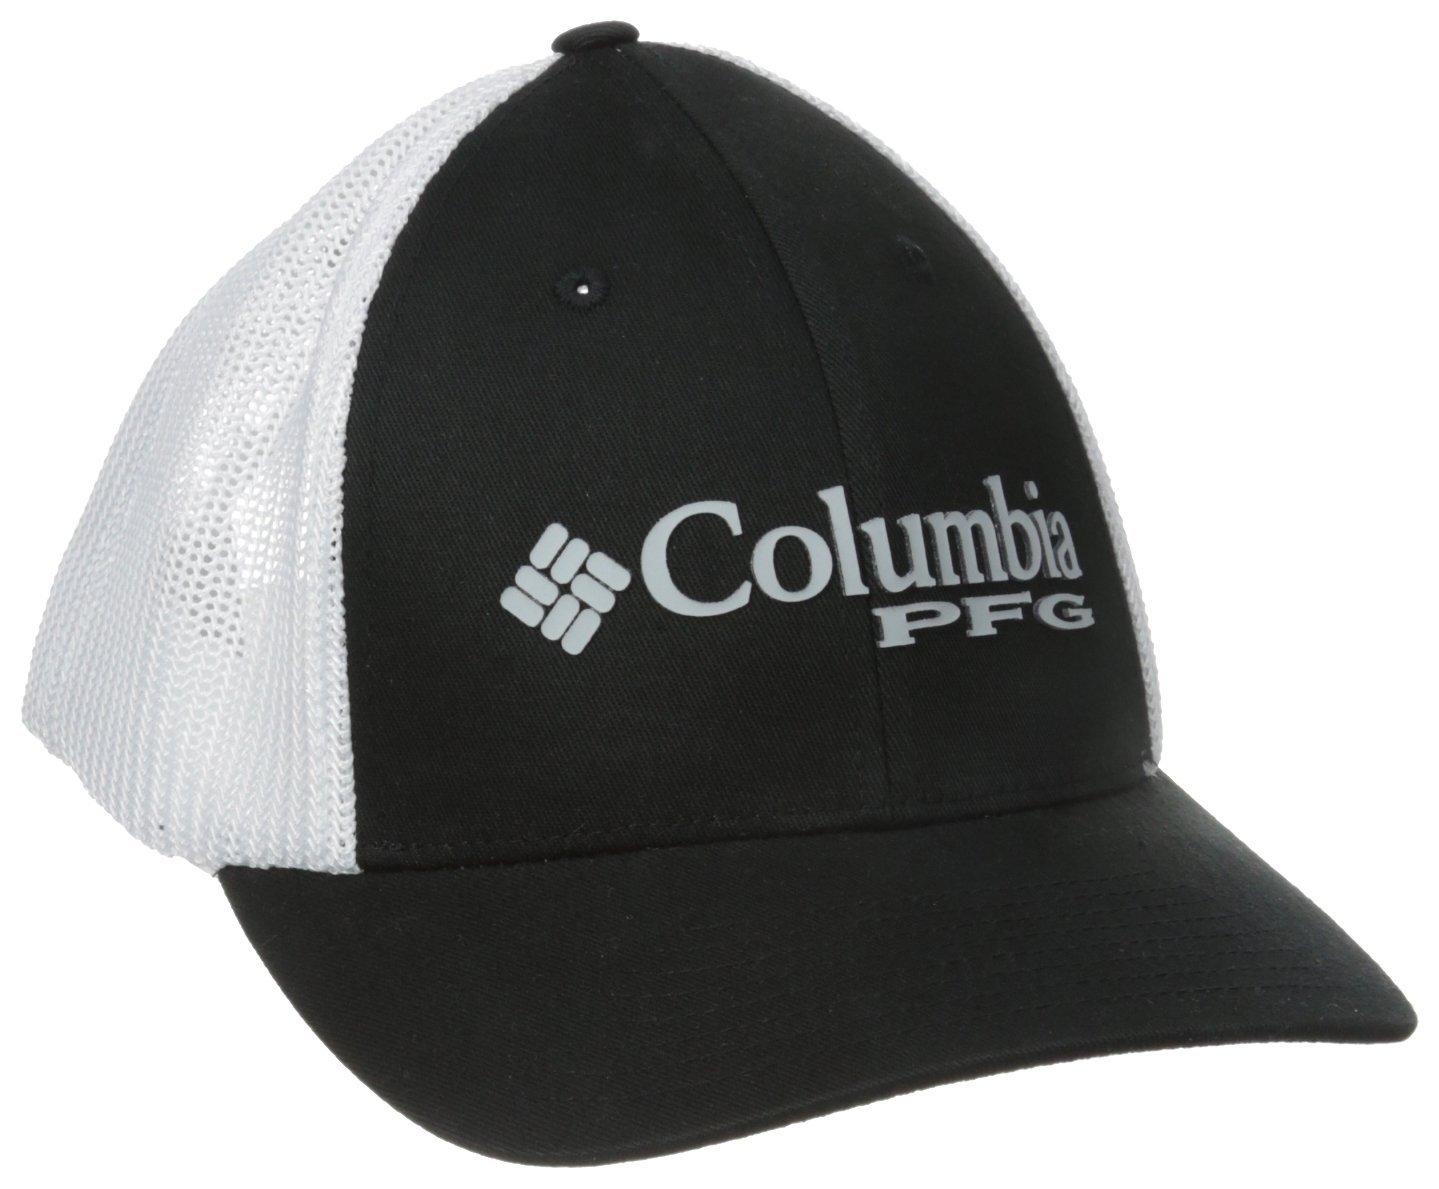 6e8fbcd88 Buy Columbia Mens PFG Mesh Snap Back Ball Cap in Cheap Price on ...